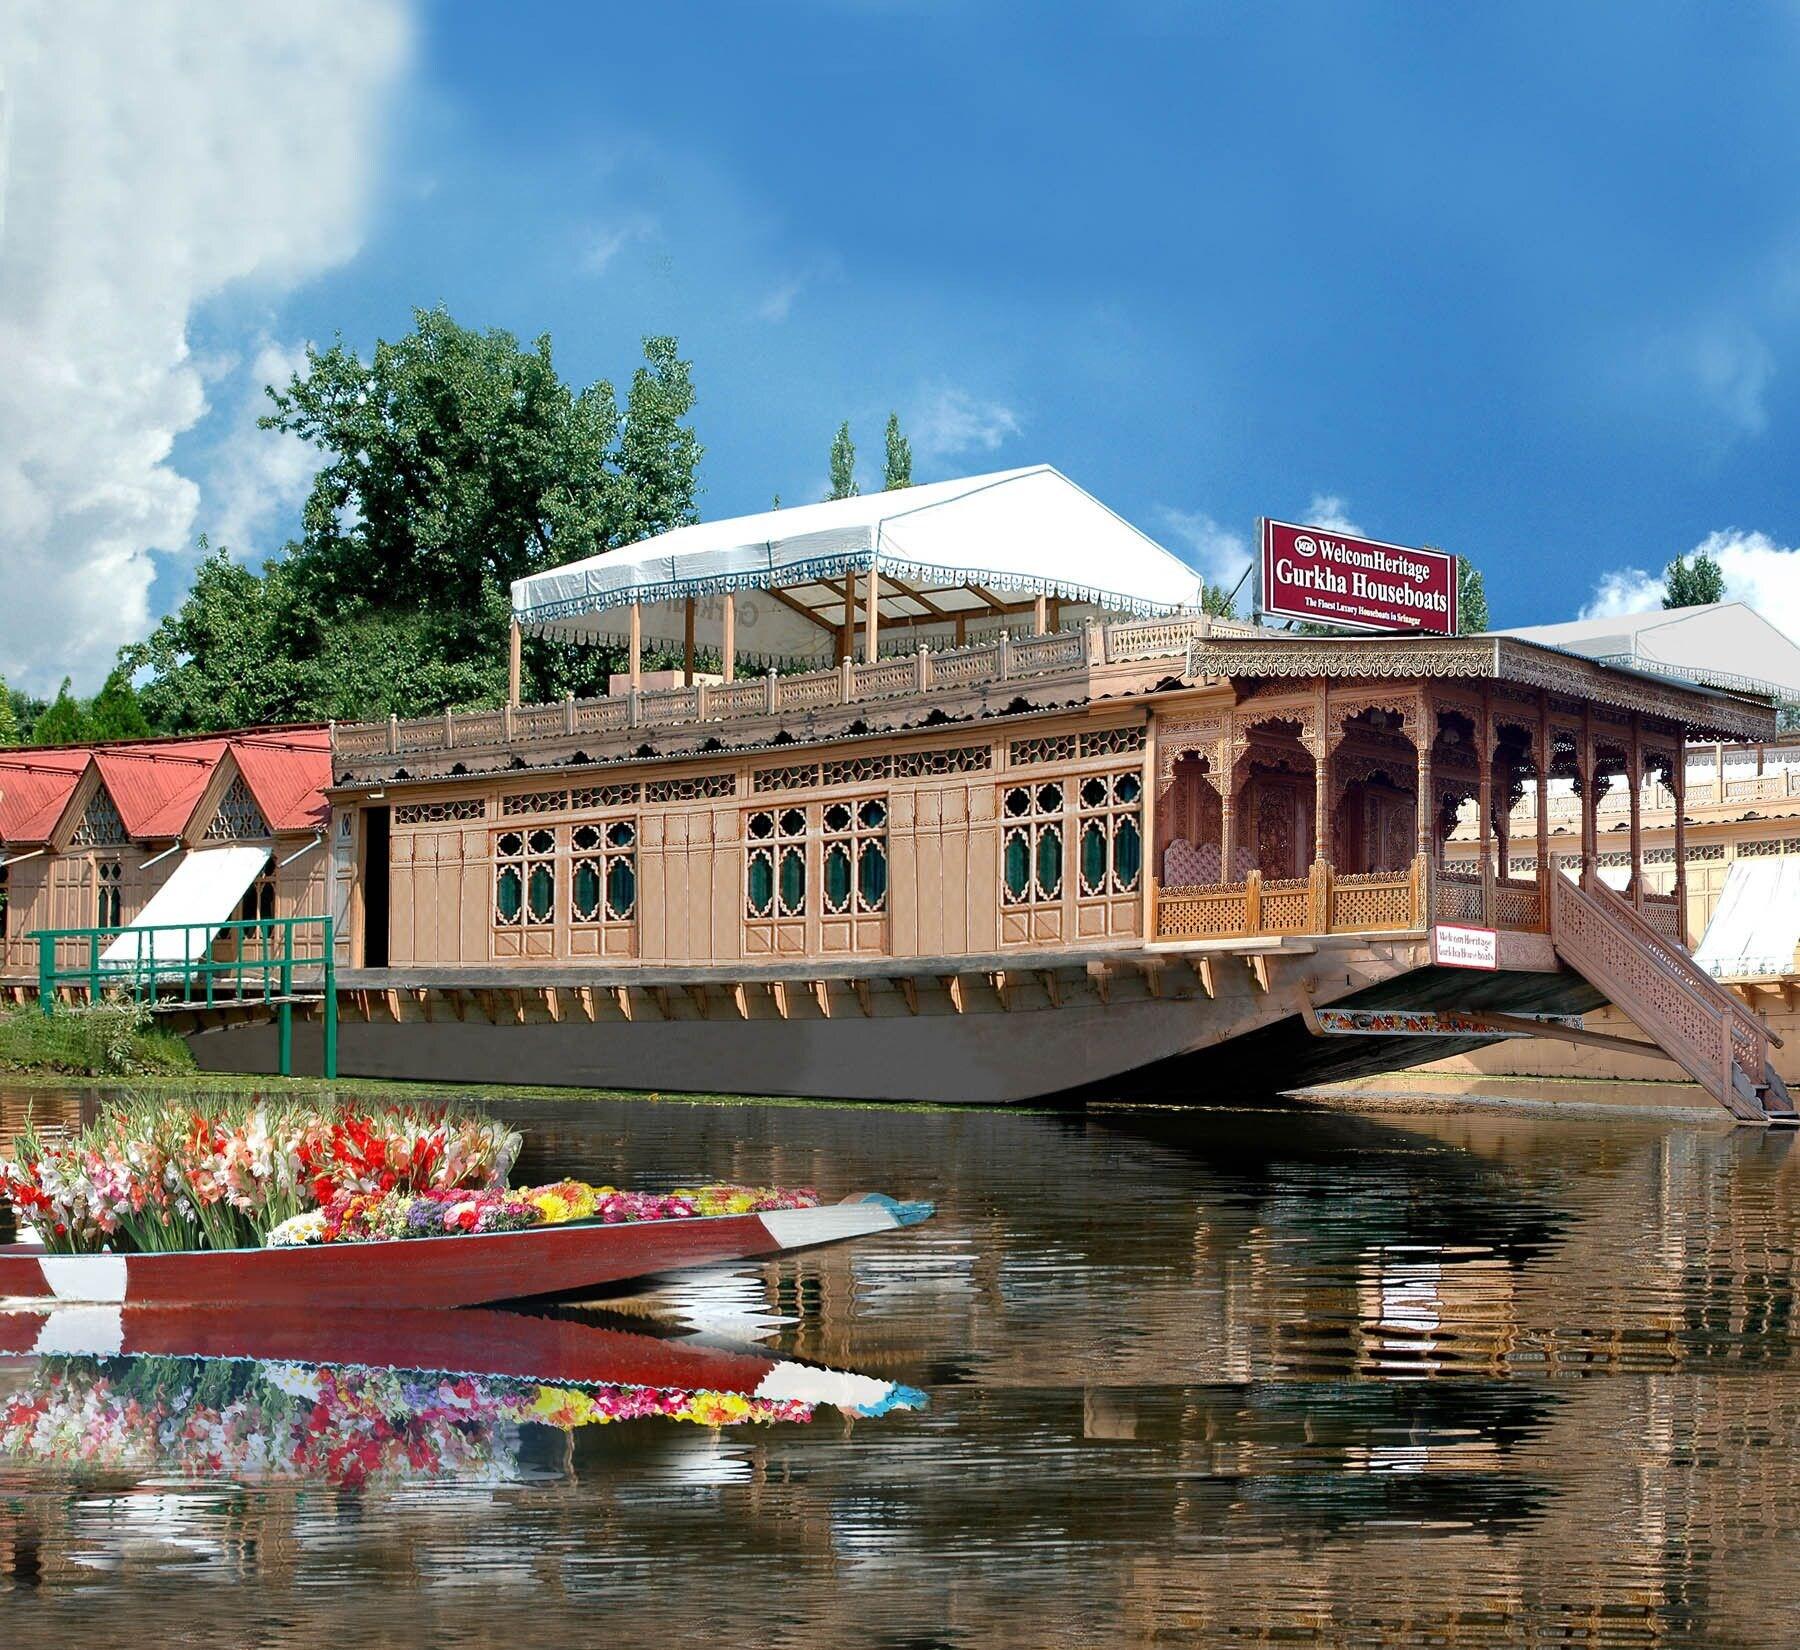 WelcomHeritage Gurkha Houseboats, Srinagar